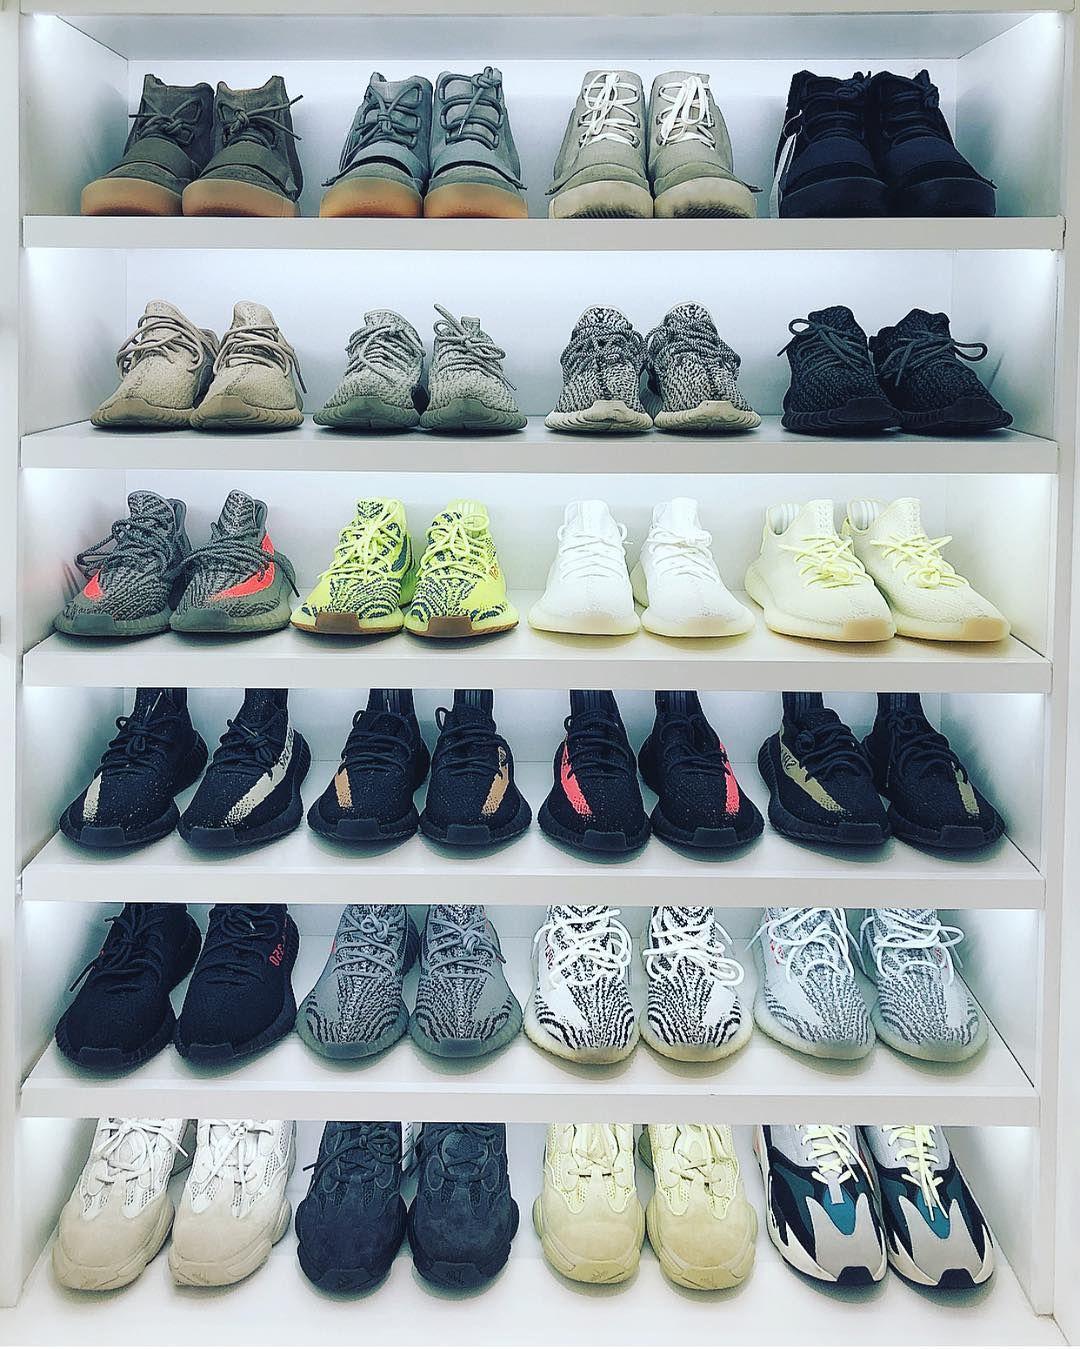 Jonathan Alonso Casual Shoes Webpage Www Thejonathanalonso Com Shoes Shoesaddicts Shoeskid Shoe In 2020 Balenciaga Schuhe Herren Yeezy Schuhe Sneaker Stiefel